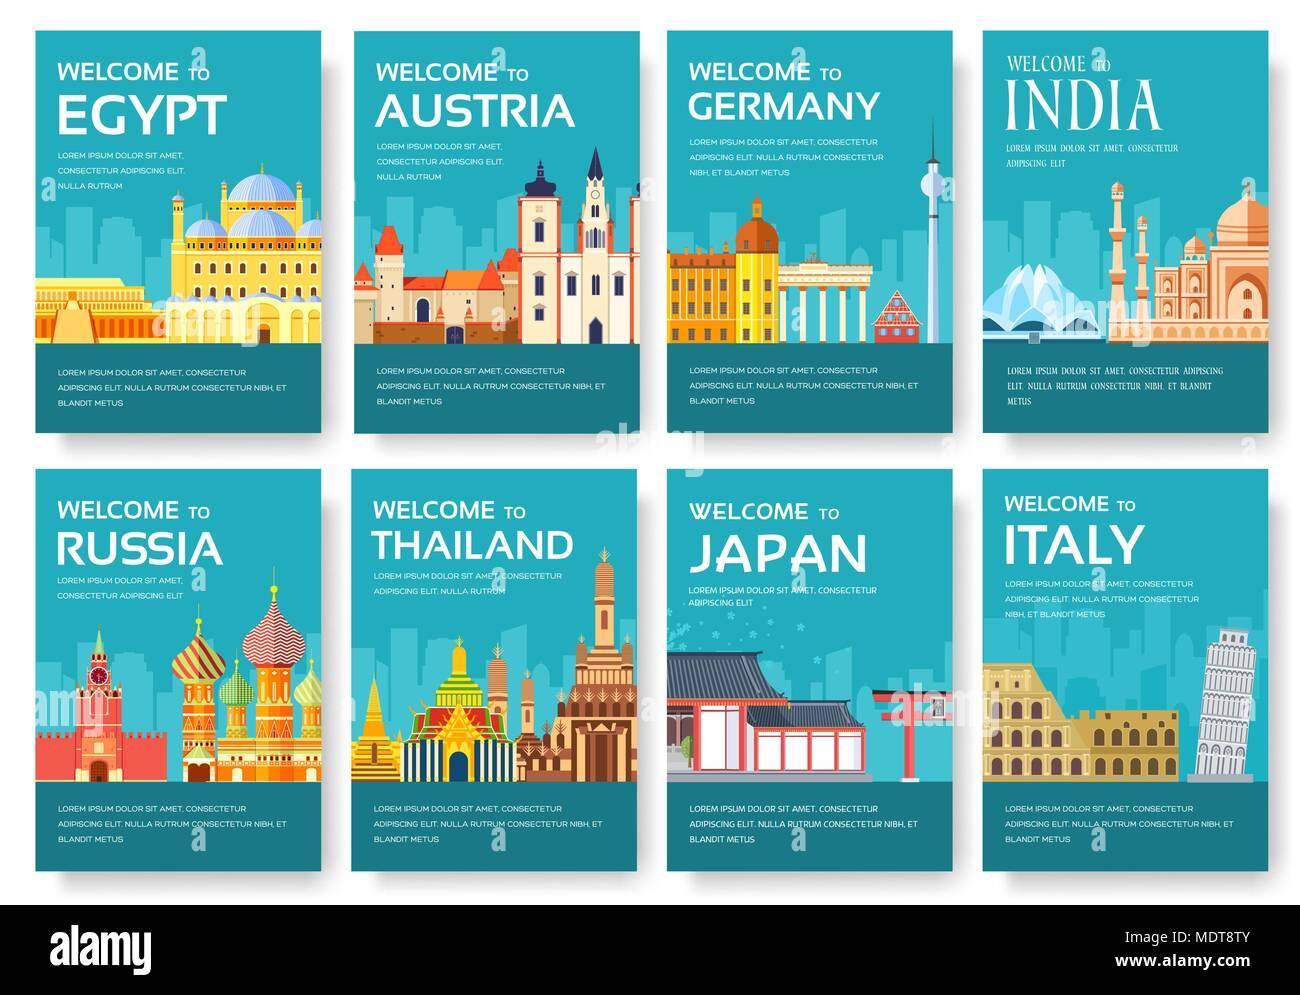 japan travel brochure template - Egypt Brochure Templates